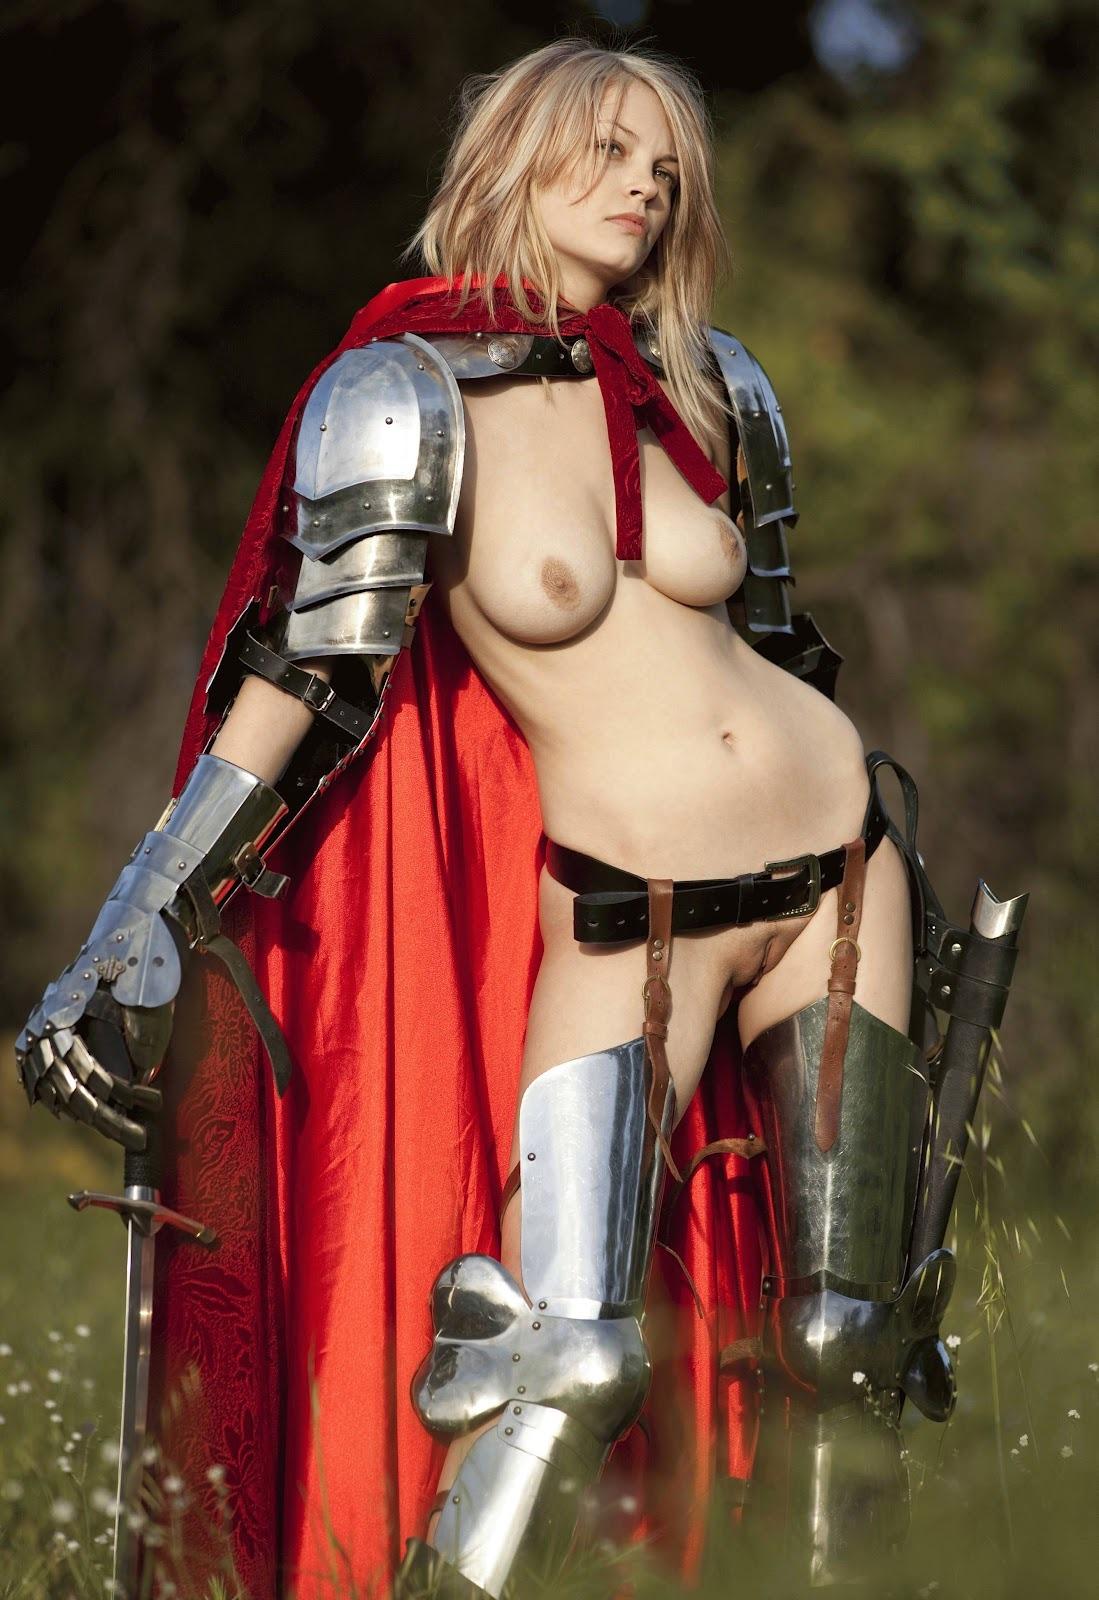 Girl in armor porn pics hentai scene